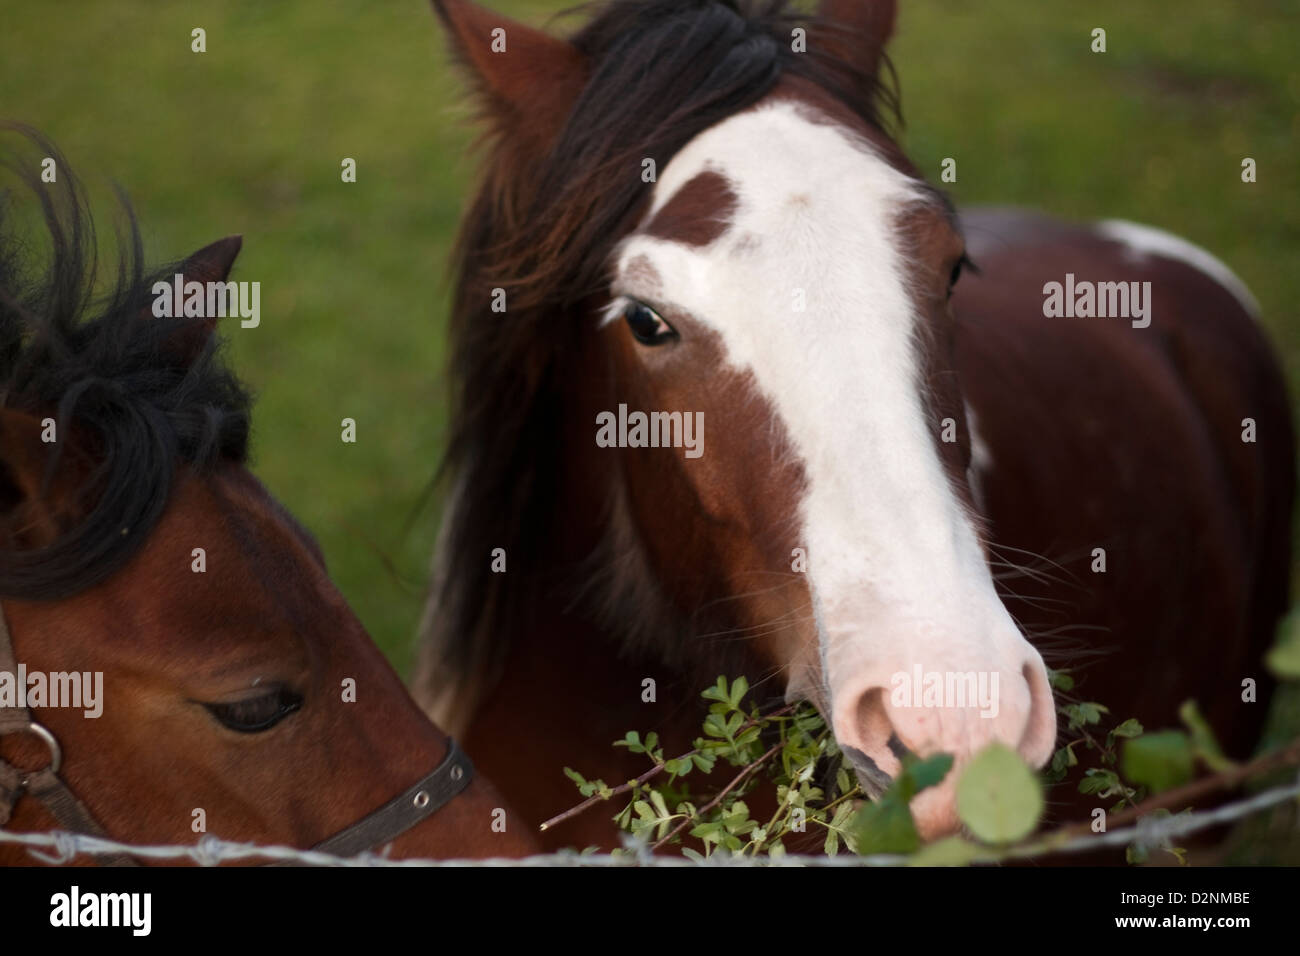 horses1 - Stock Image